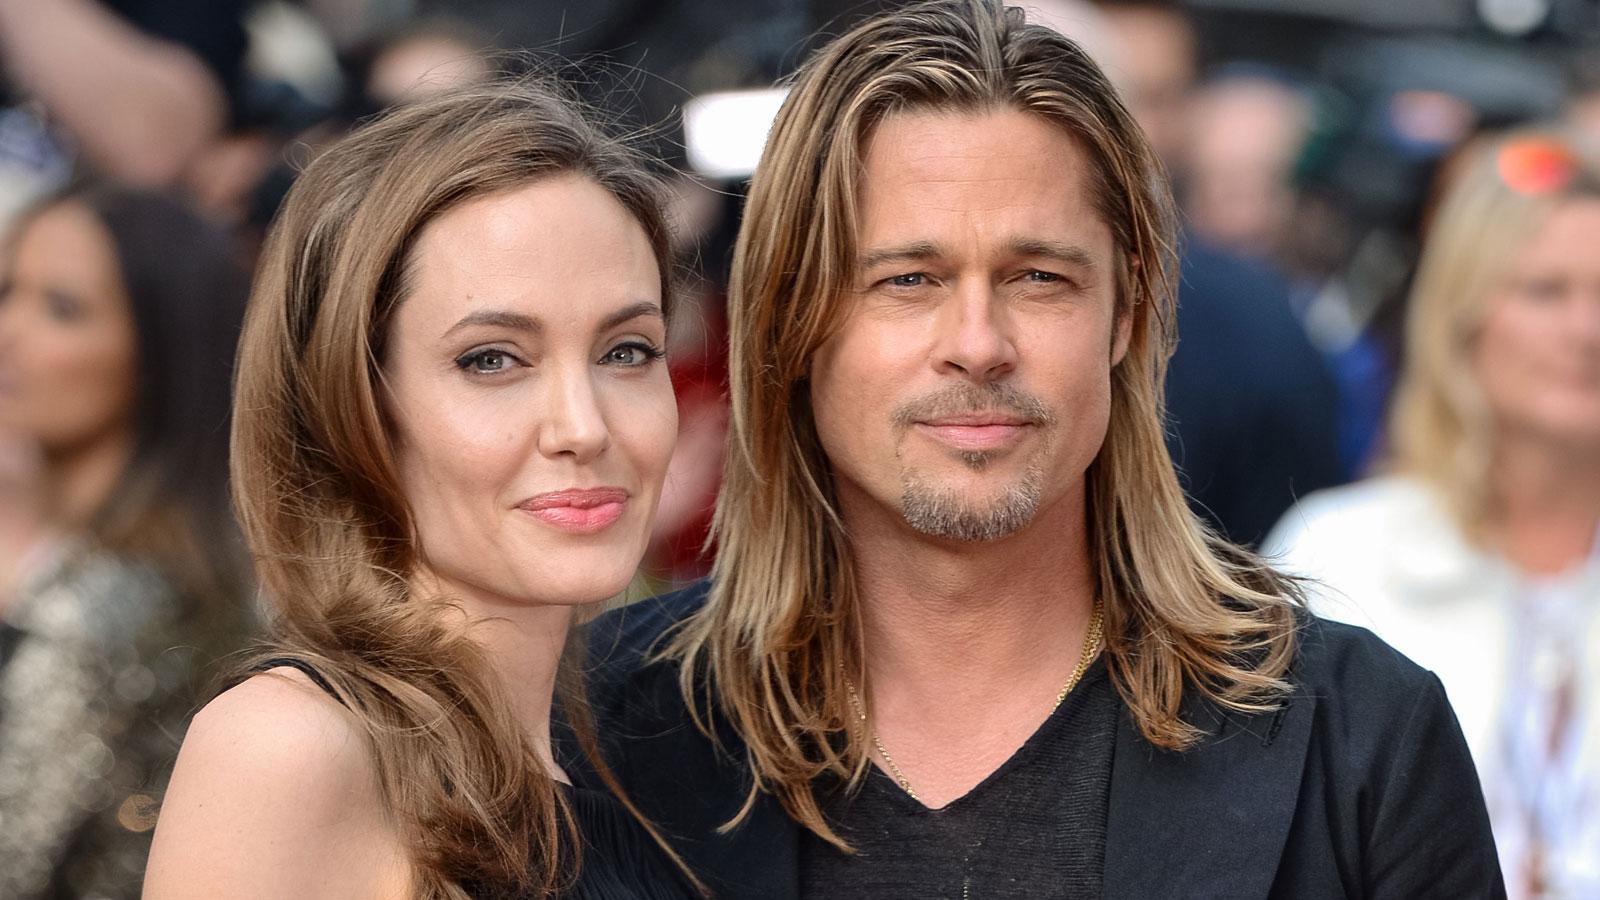 VÍDEO: Brad Pitt acusa a Angelina Jolie por ser una manipuladora